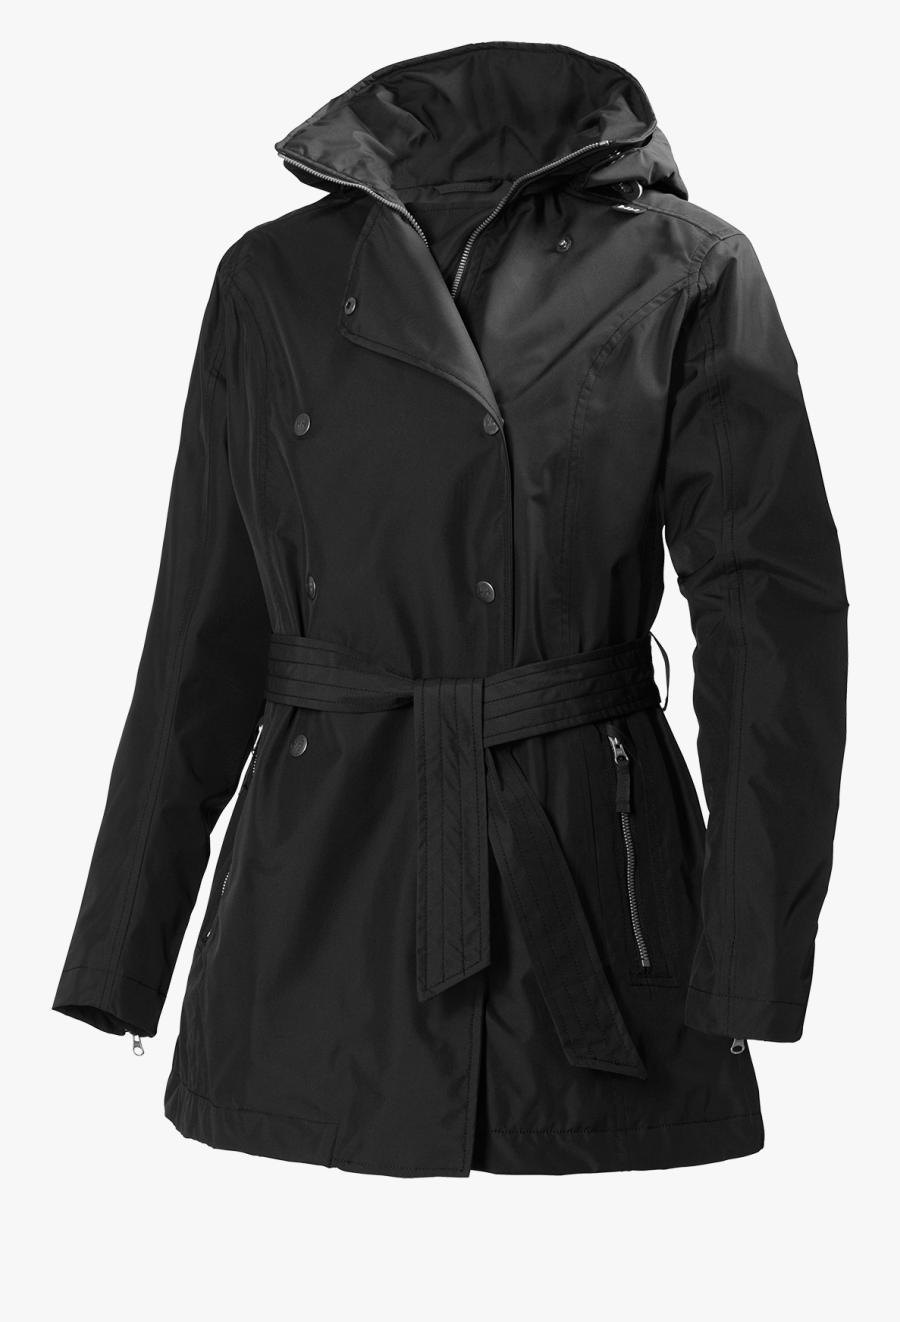 Helly Hansen Trench Coat Raincoat Jacket - Helly Hansen Women's Trench Coat, Transparent Clipart